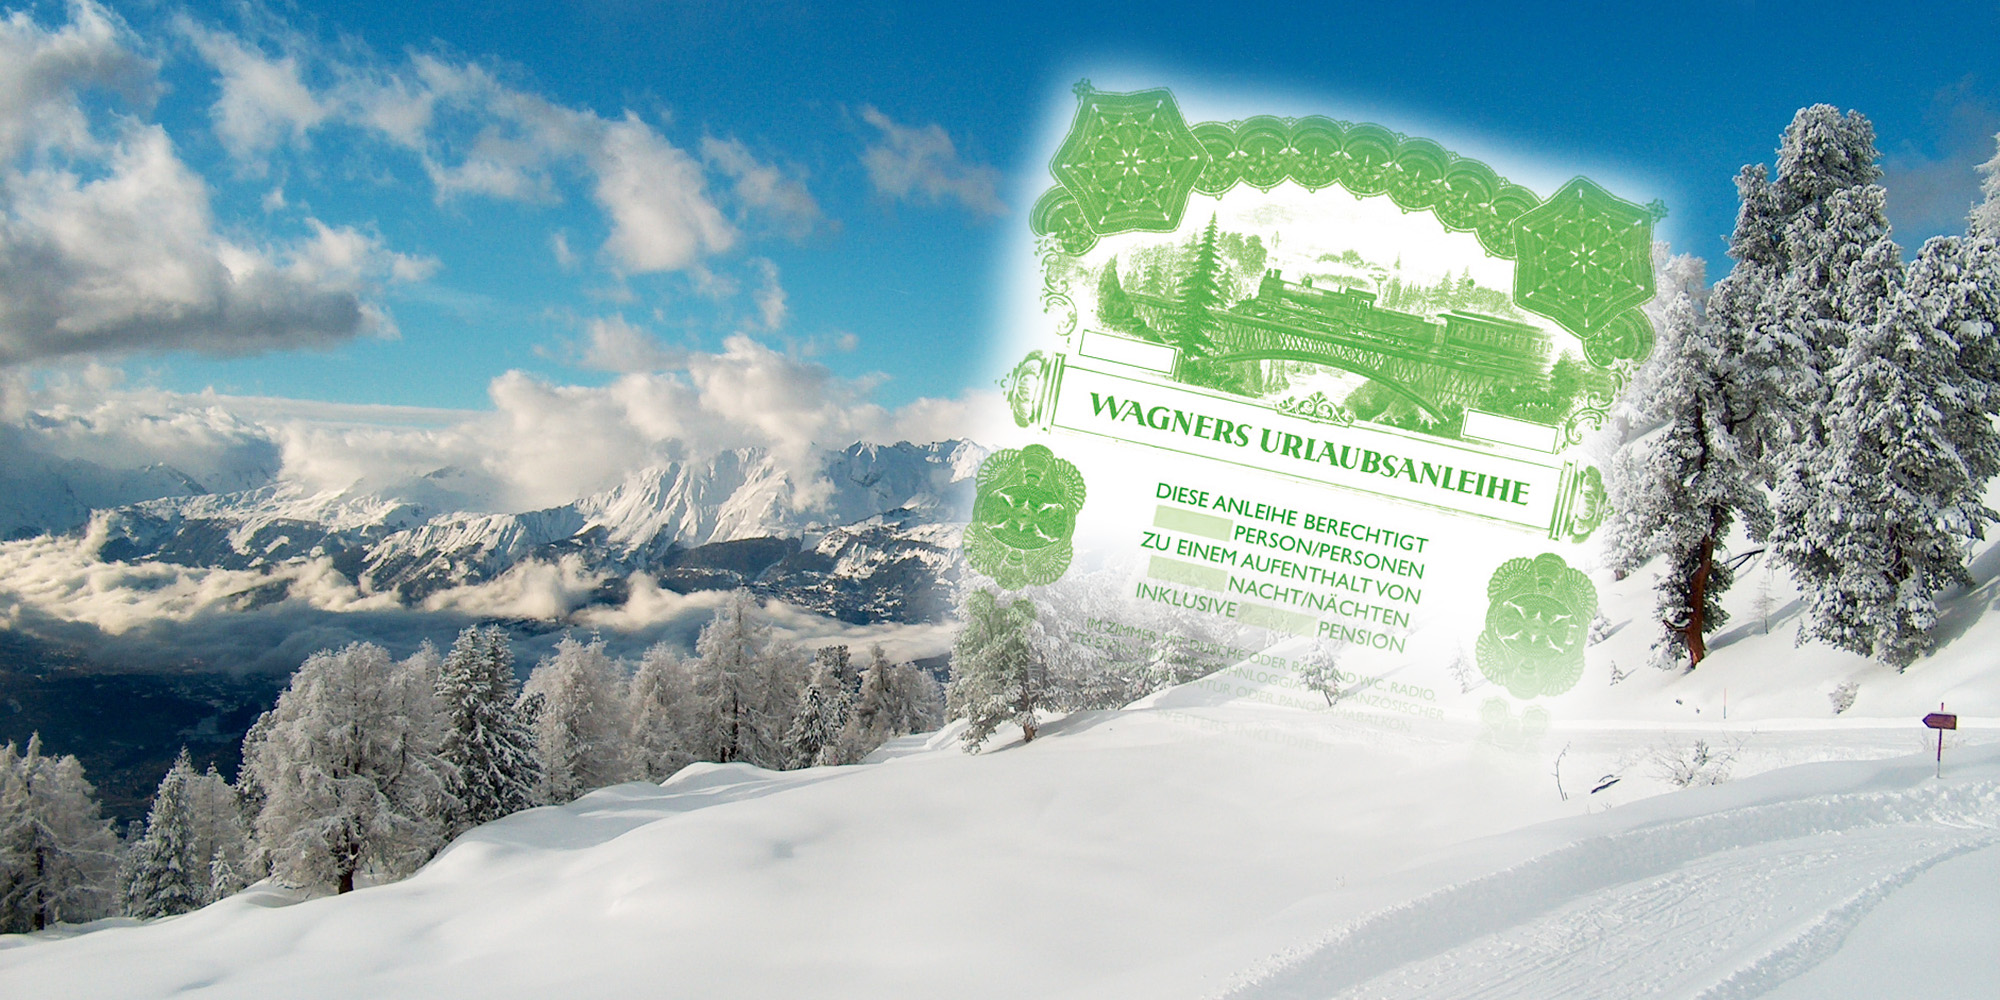 Wagners-Urlaubsanleihe-Slider